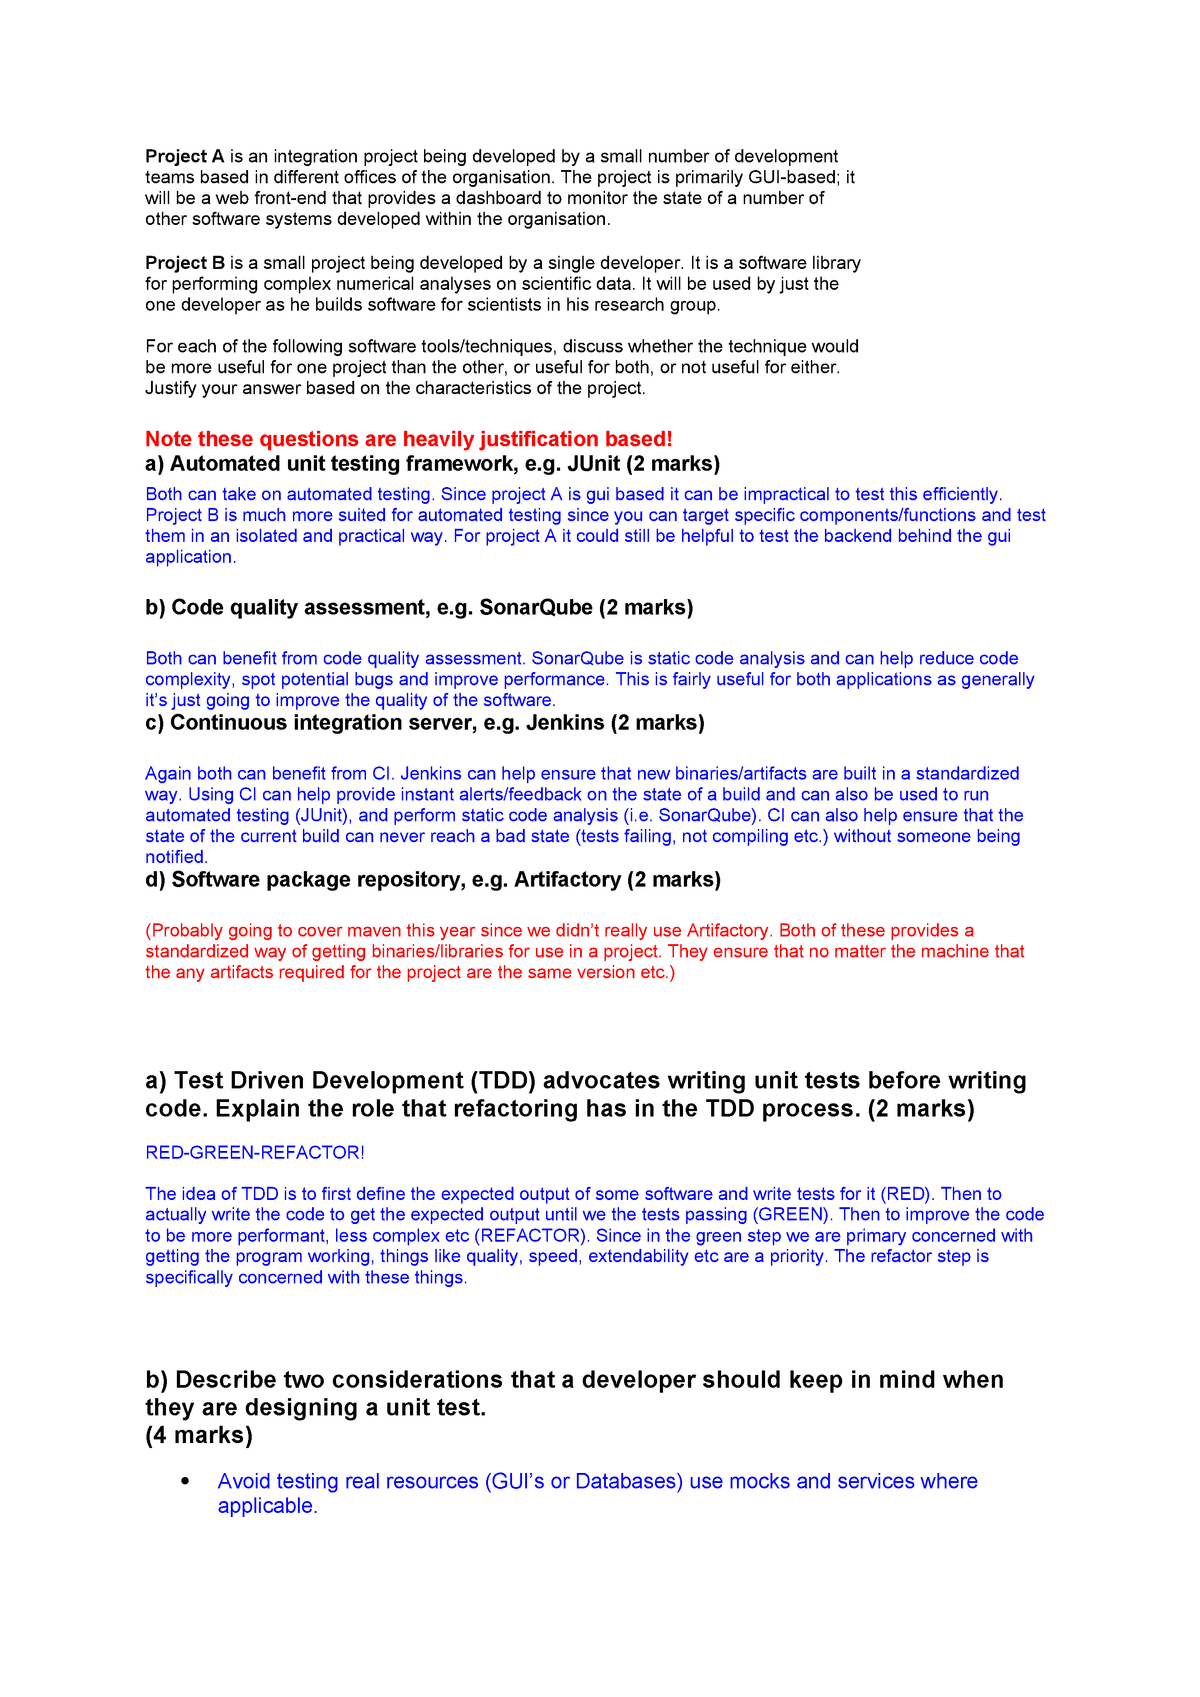 Exam 2015 - DECO2800: Design Computing Studio 2 - Testing